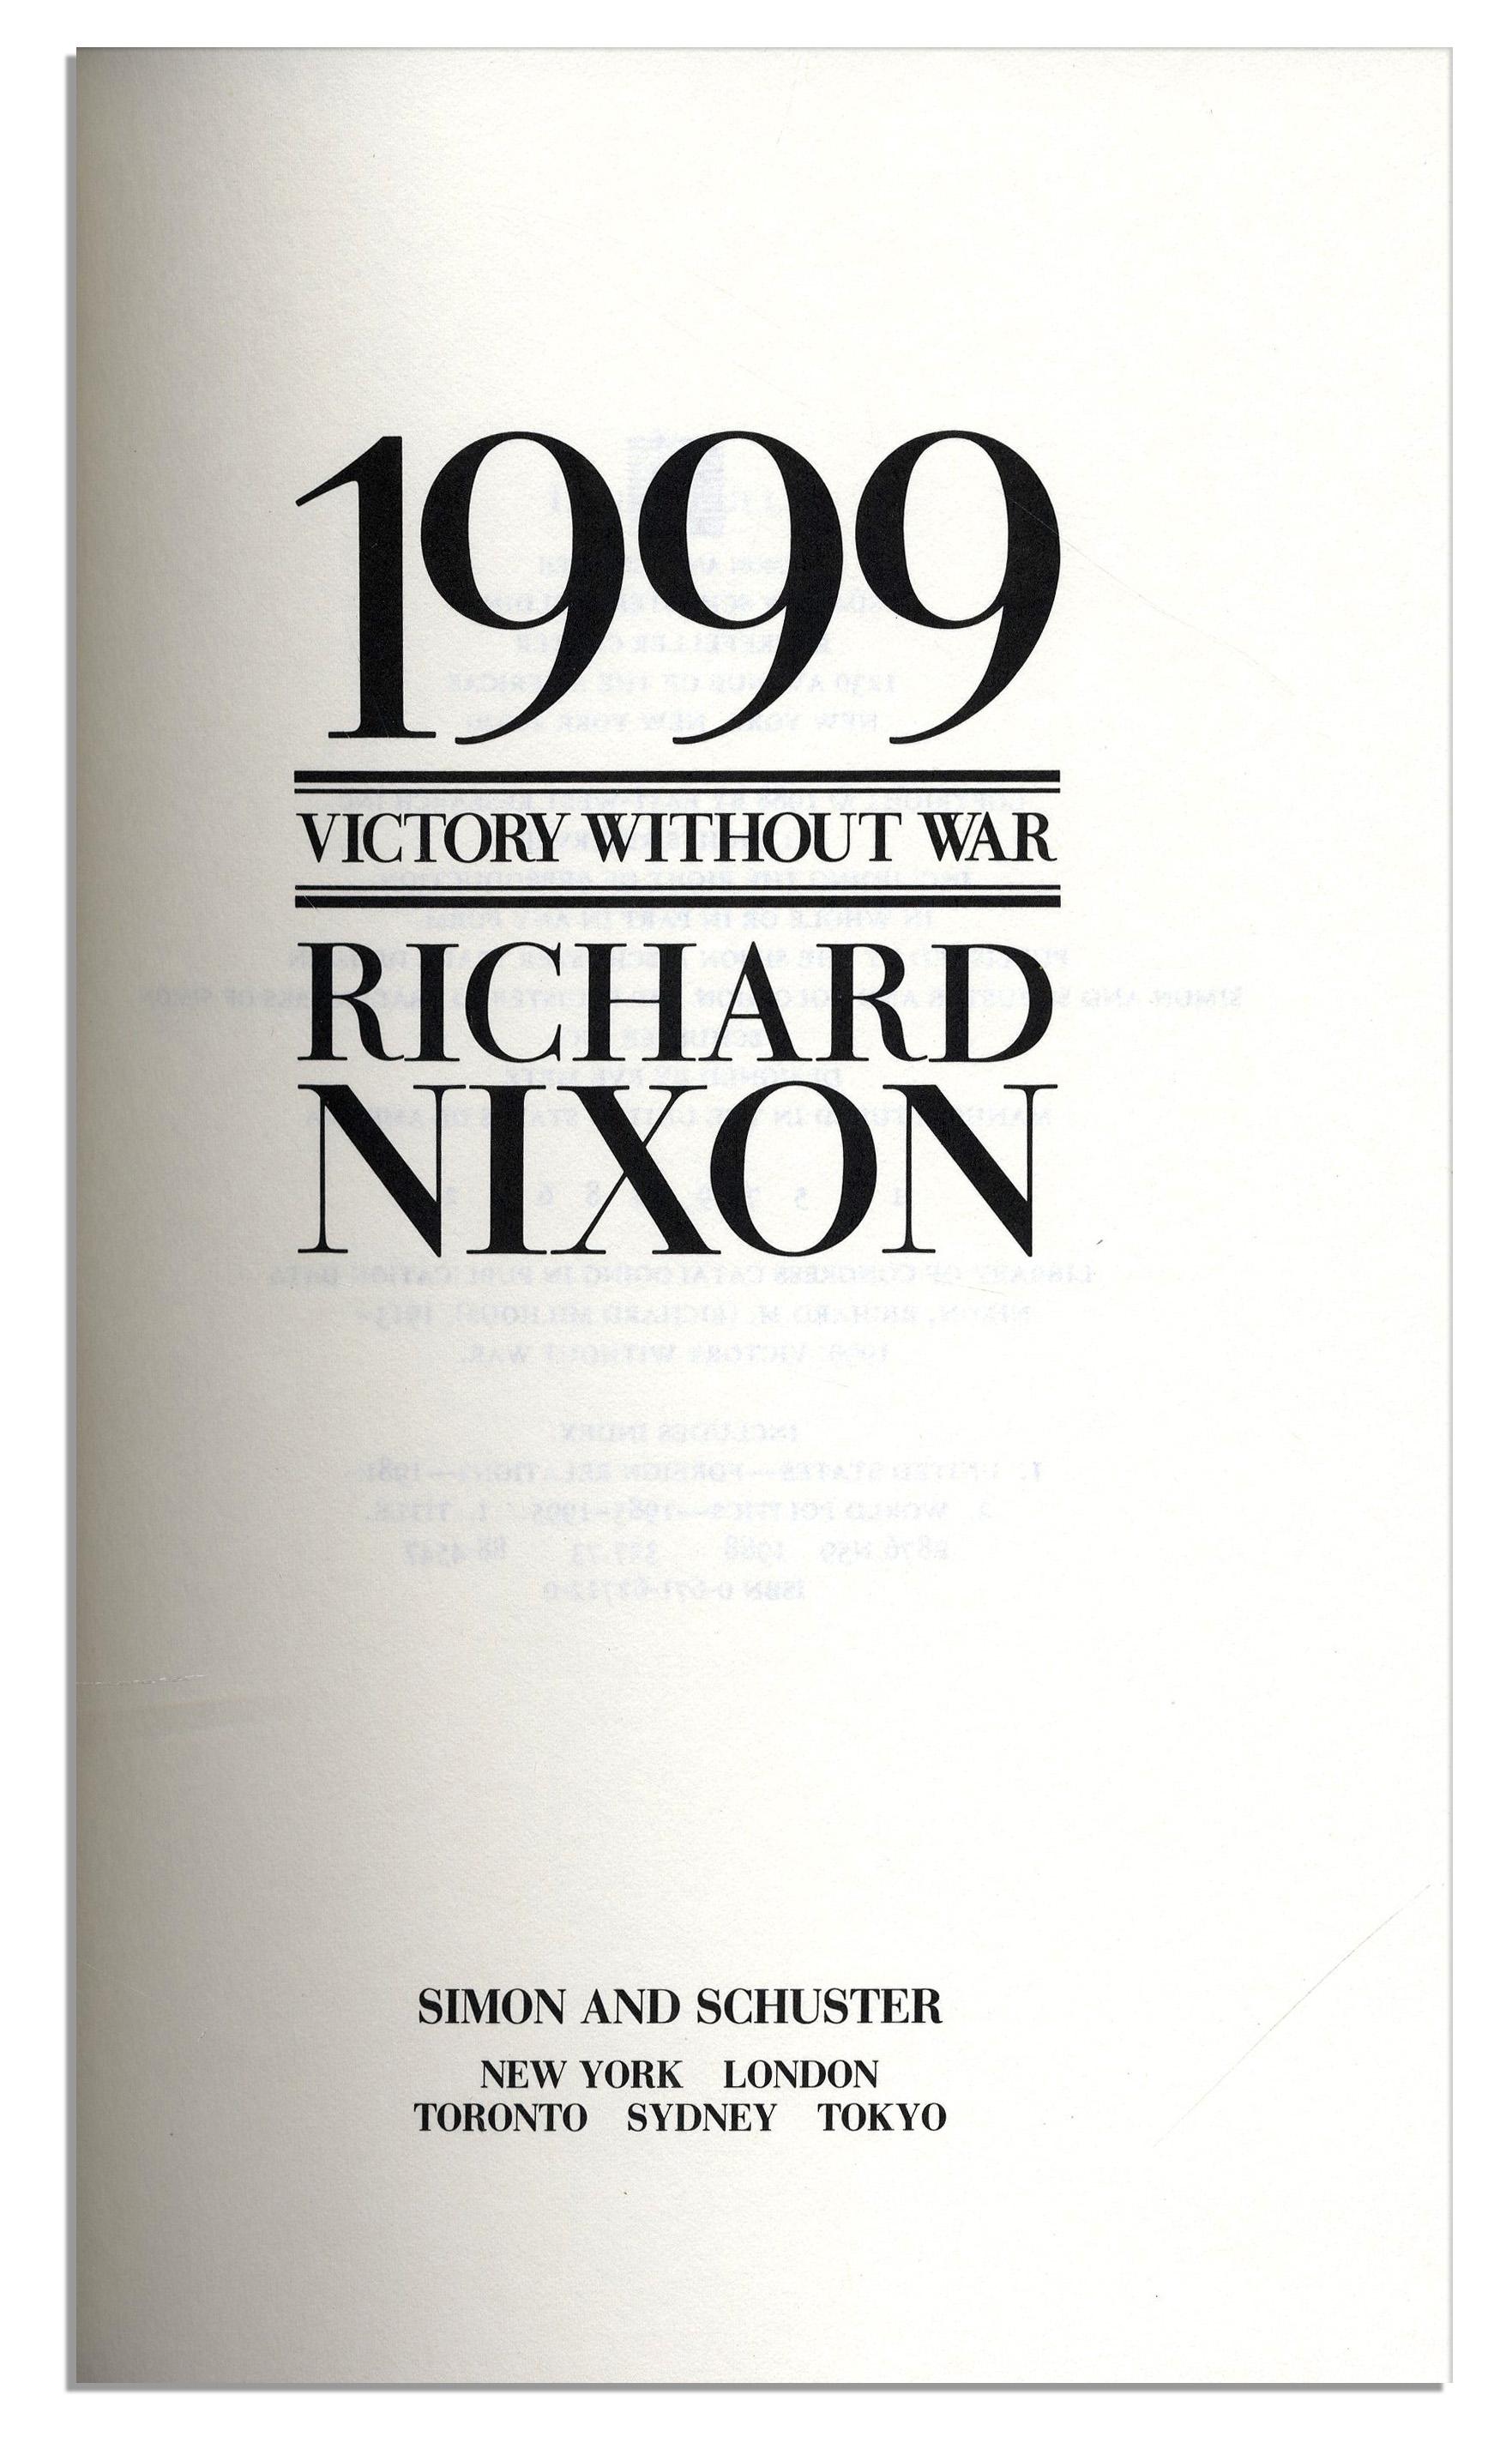 essay questions on richard nixon